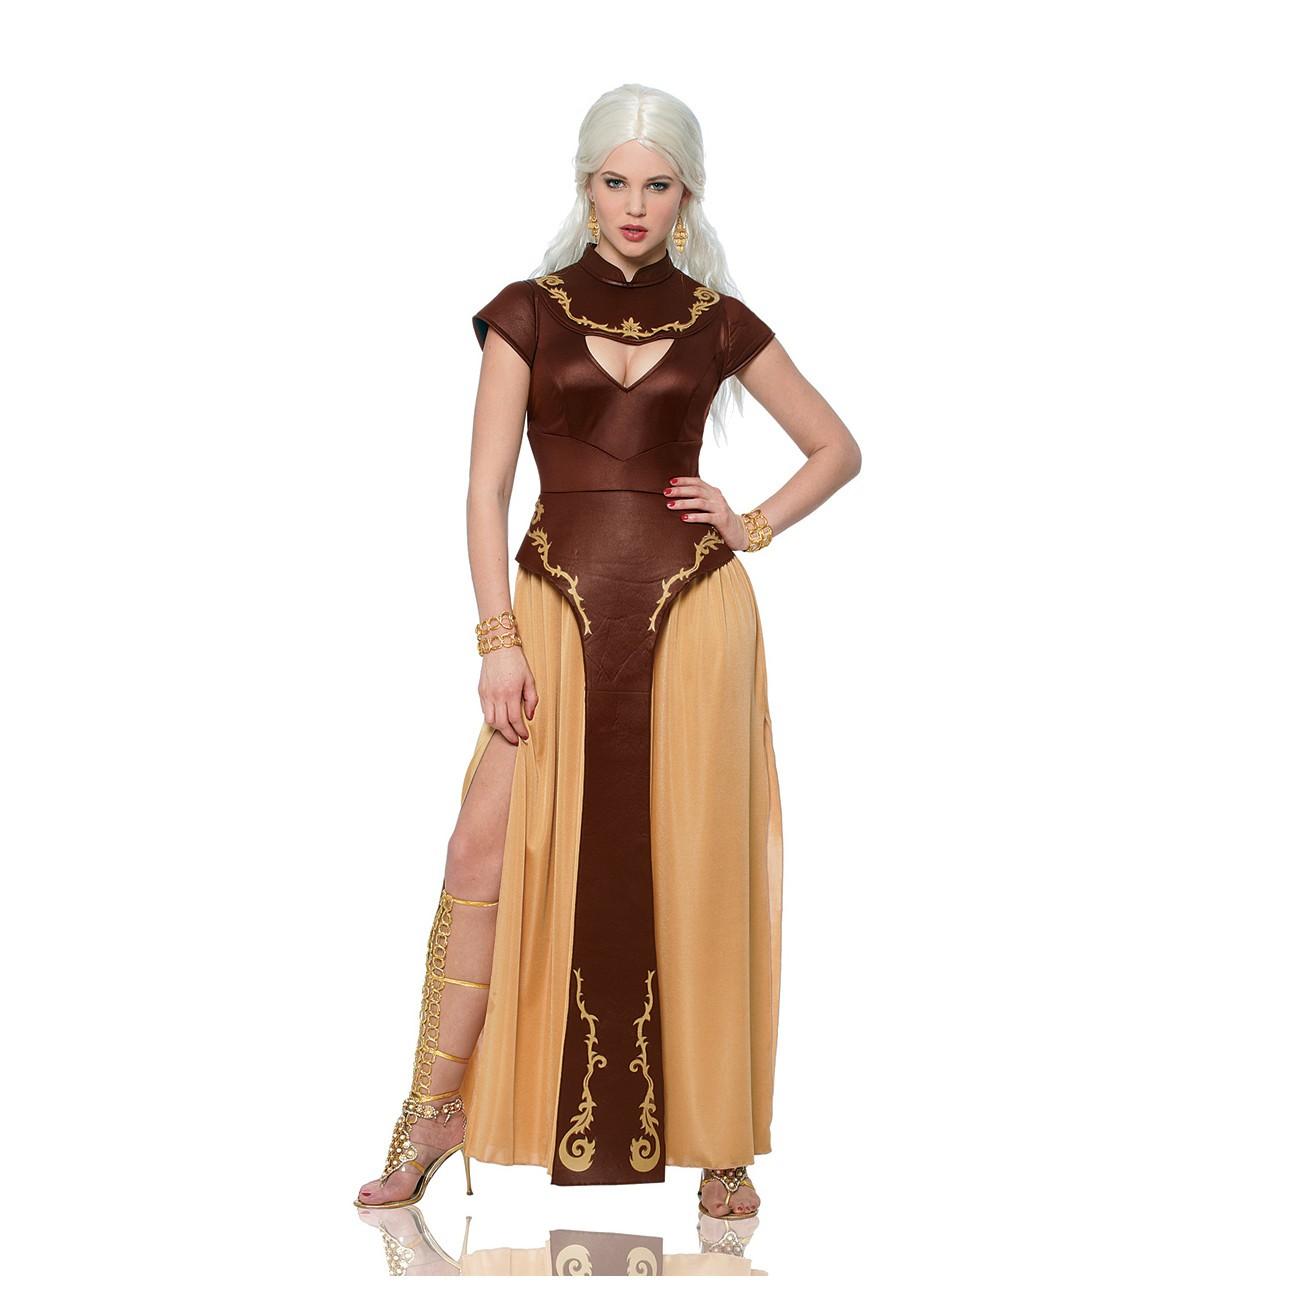 daenerys targaryen khalessi womens costume. Black Bedroom Furniture Sets. Home Design Ideas